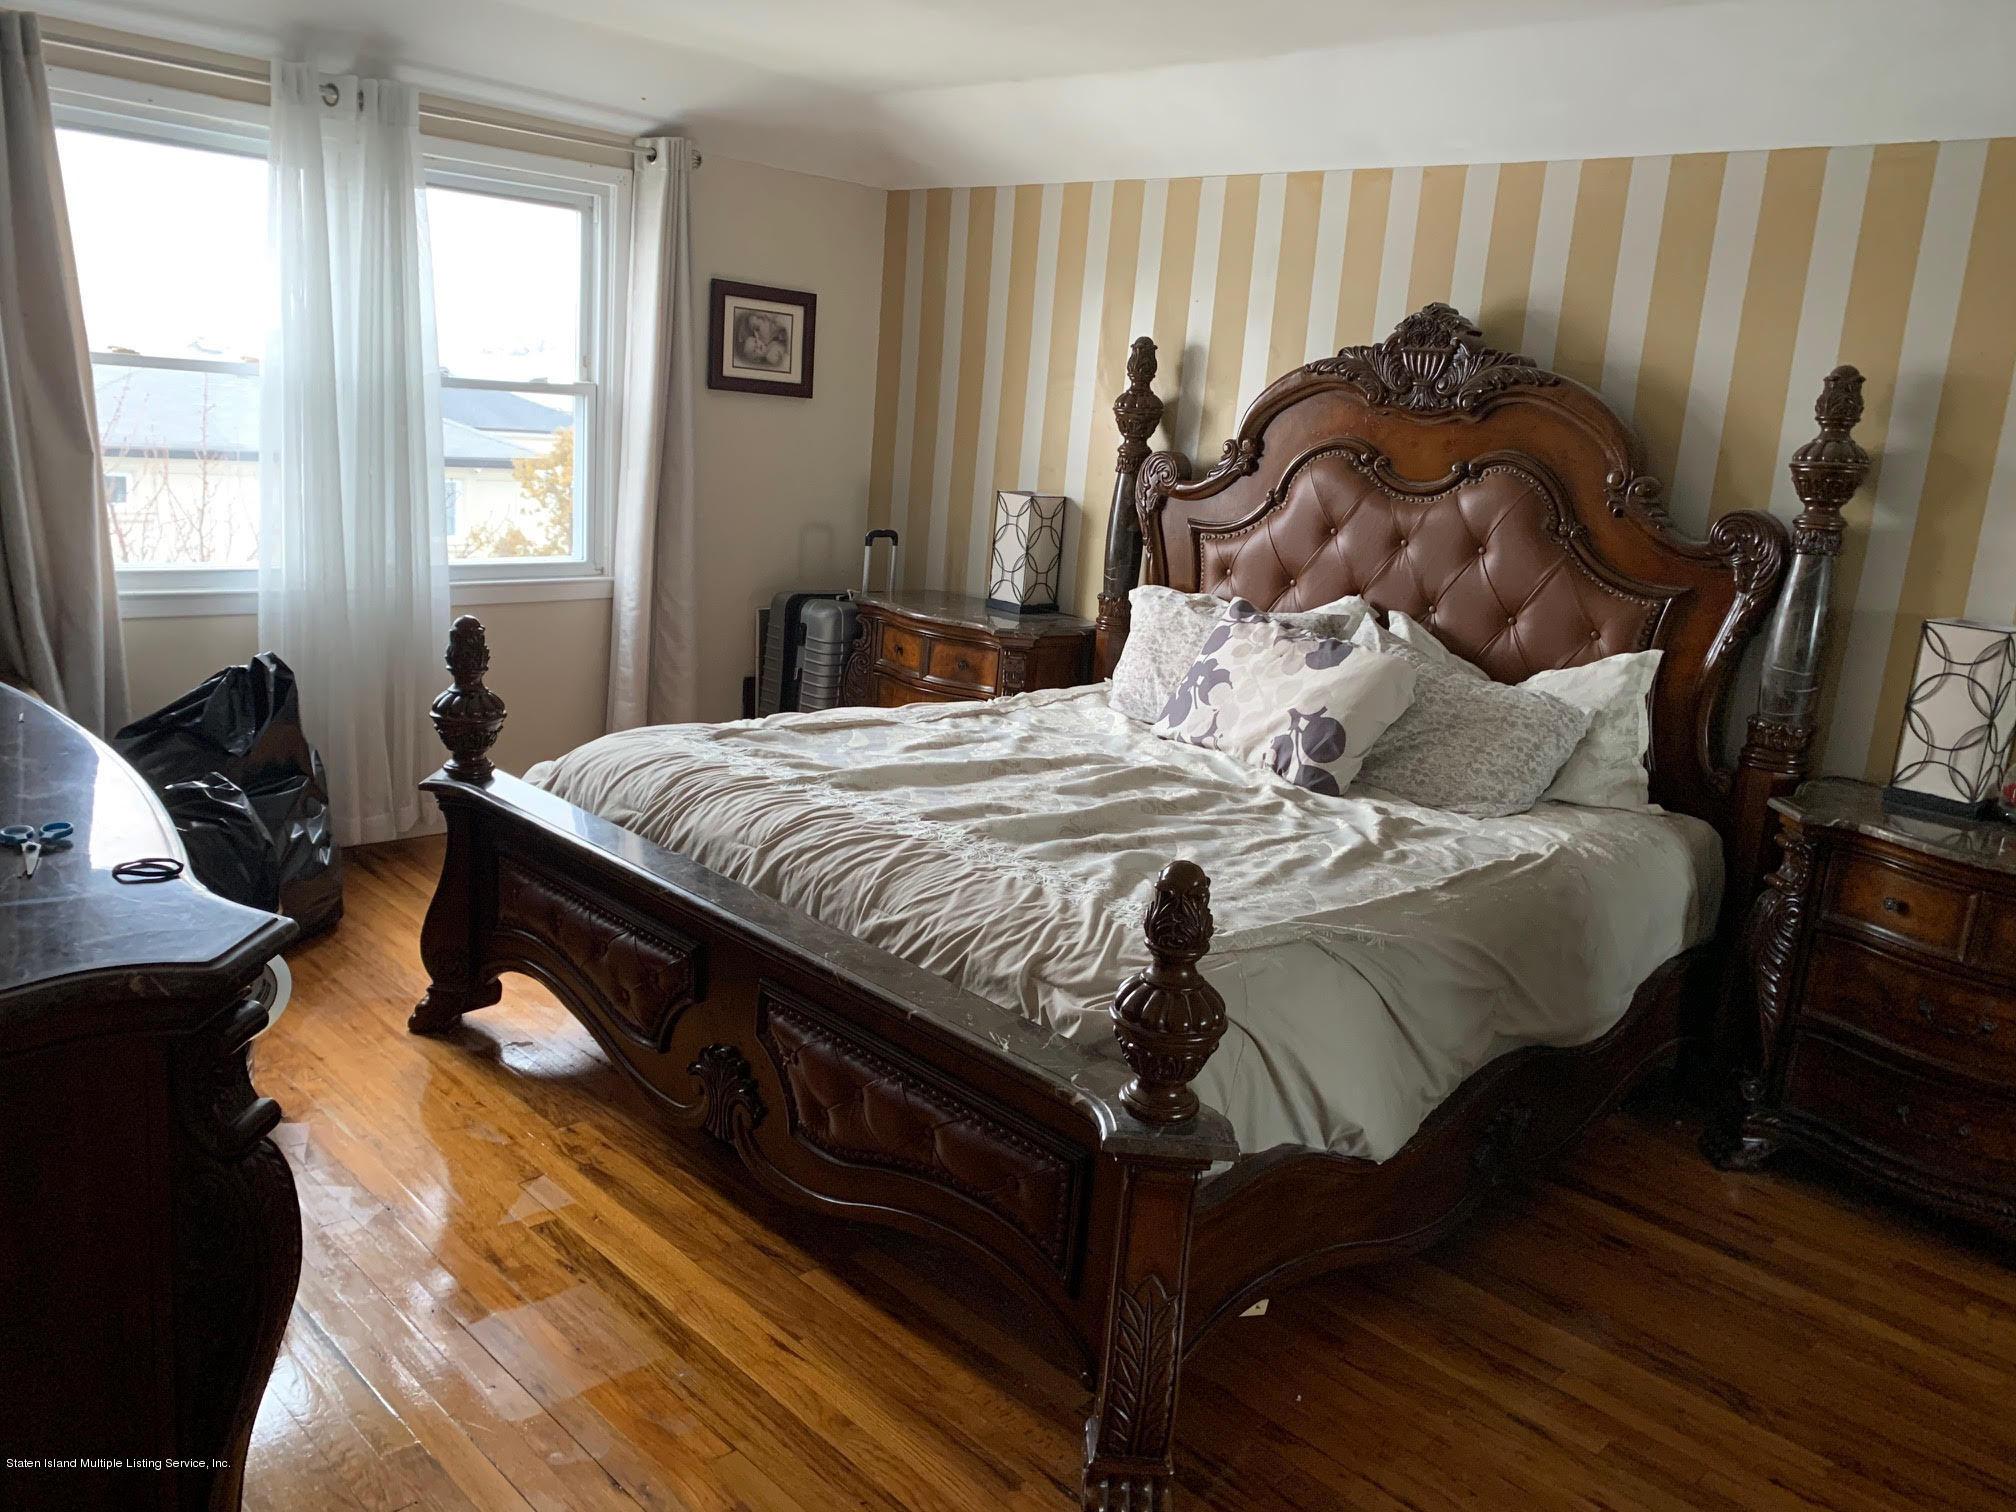 76 Fraser Street,Staten Island,New York,10314,United States,3 Bedrooms Bedrooms,7 Rooms Rooms,4 BathroomsBathrooms,Res-Rental,Fraser,1135693